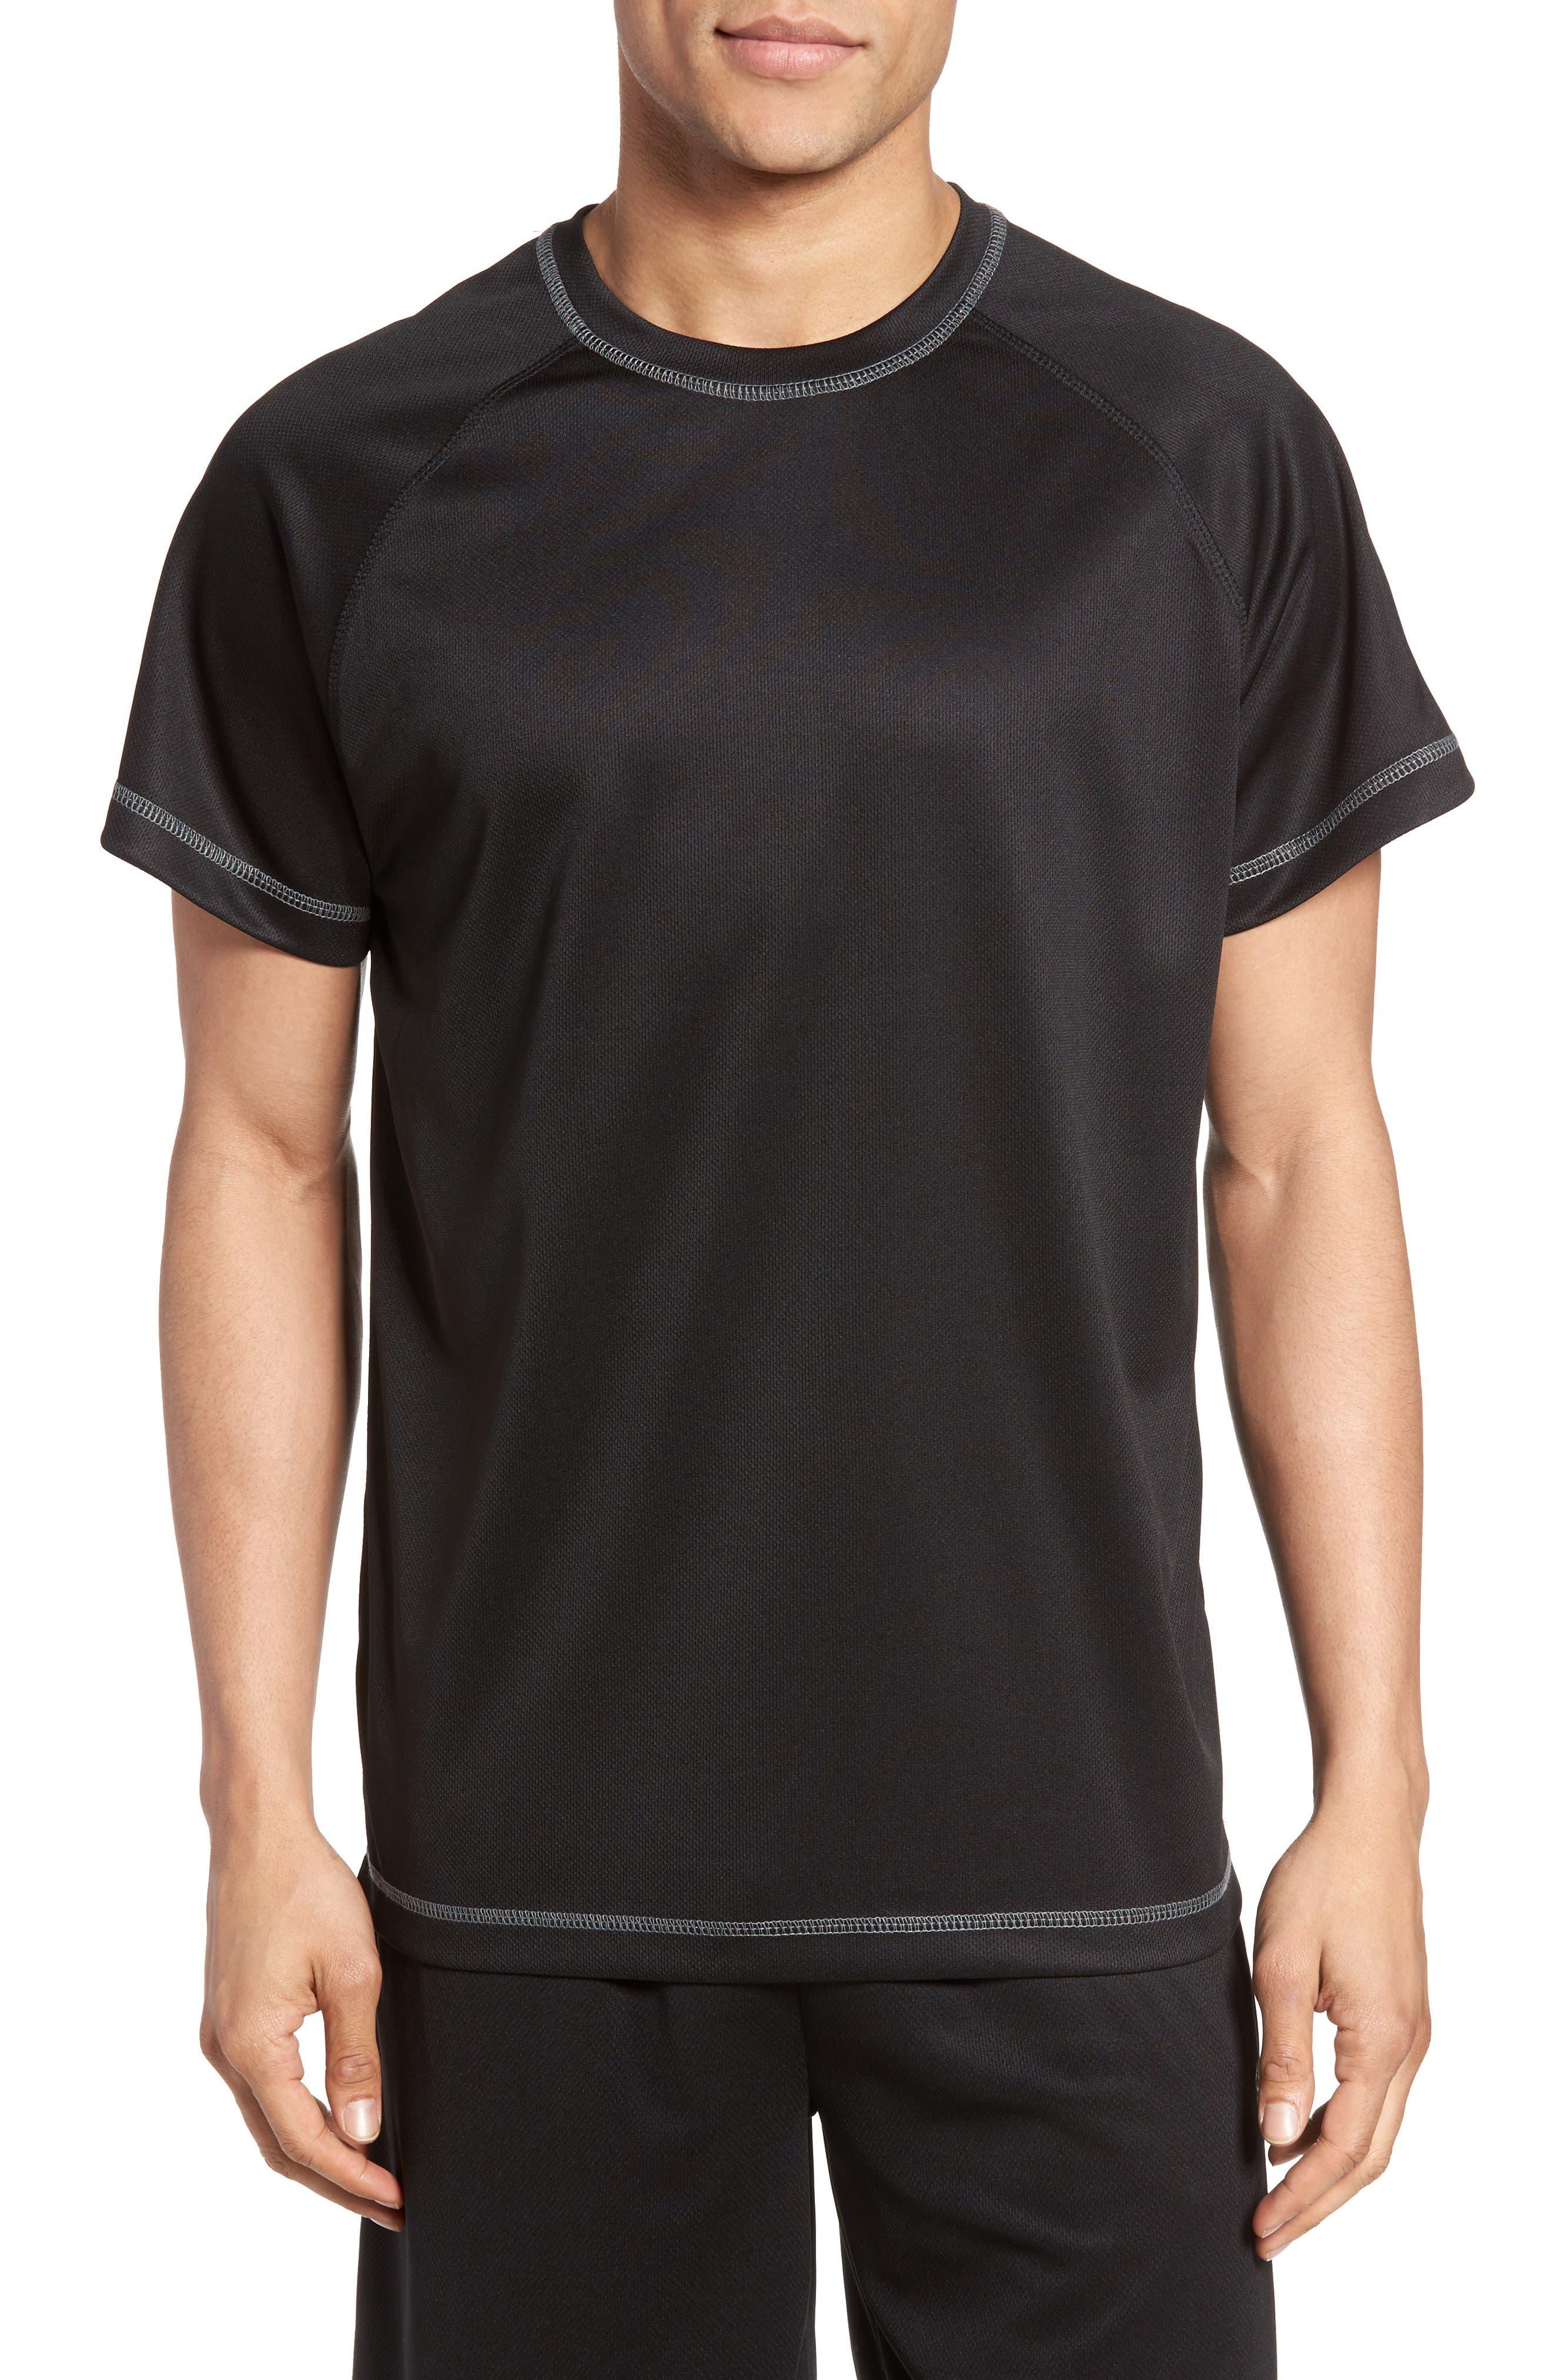 Work Out Crewneck T-Shirt,                             Main thumbnail 1, color,                             Black